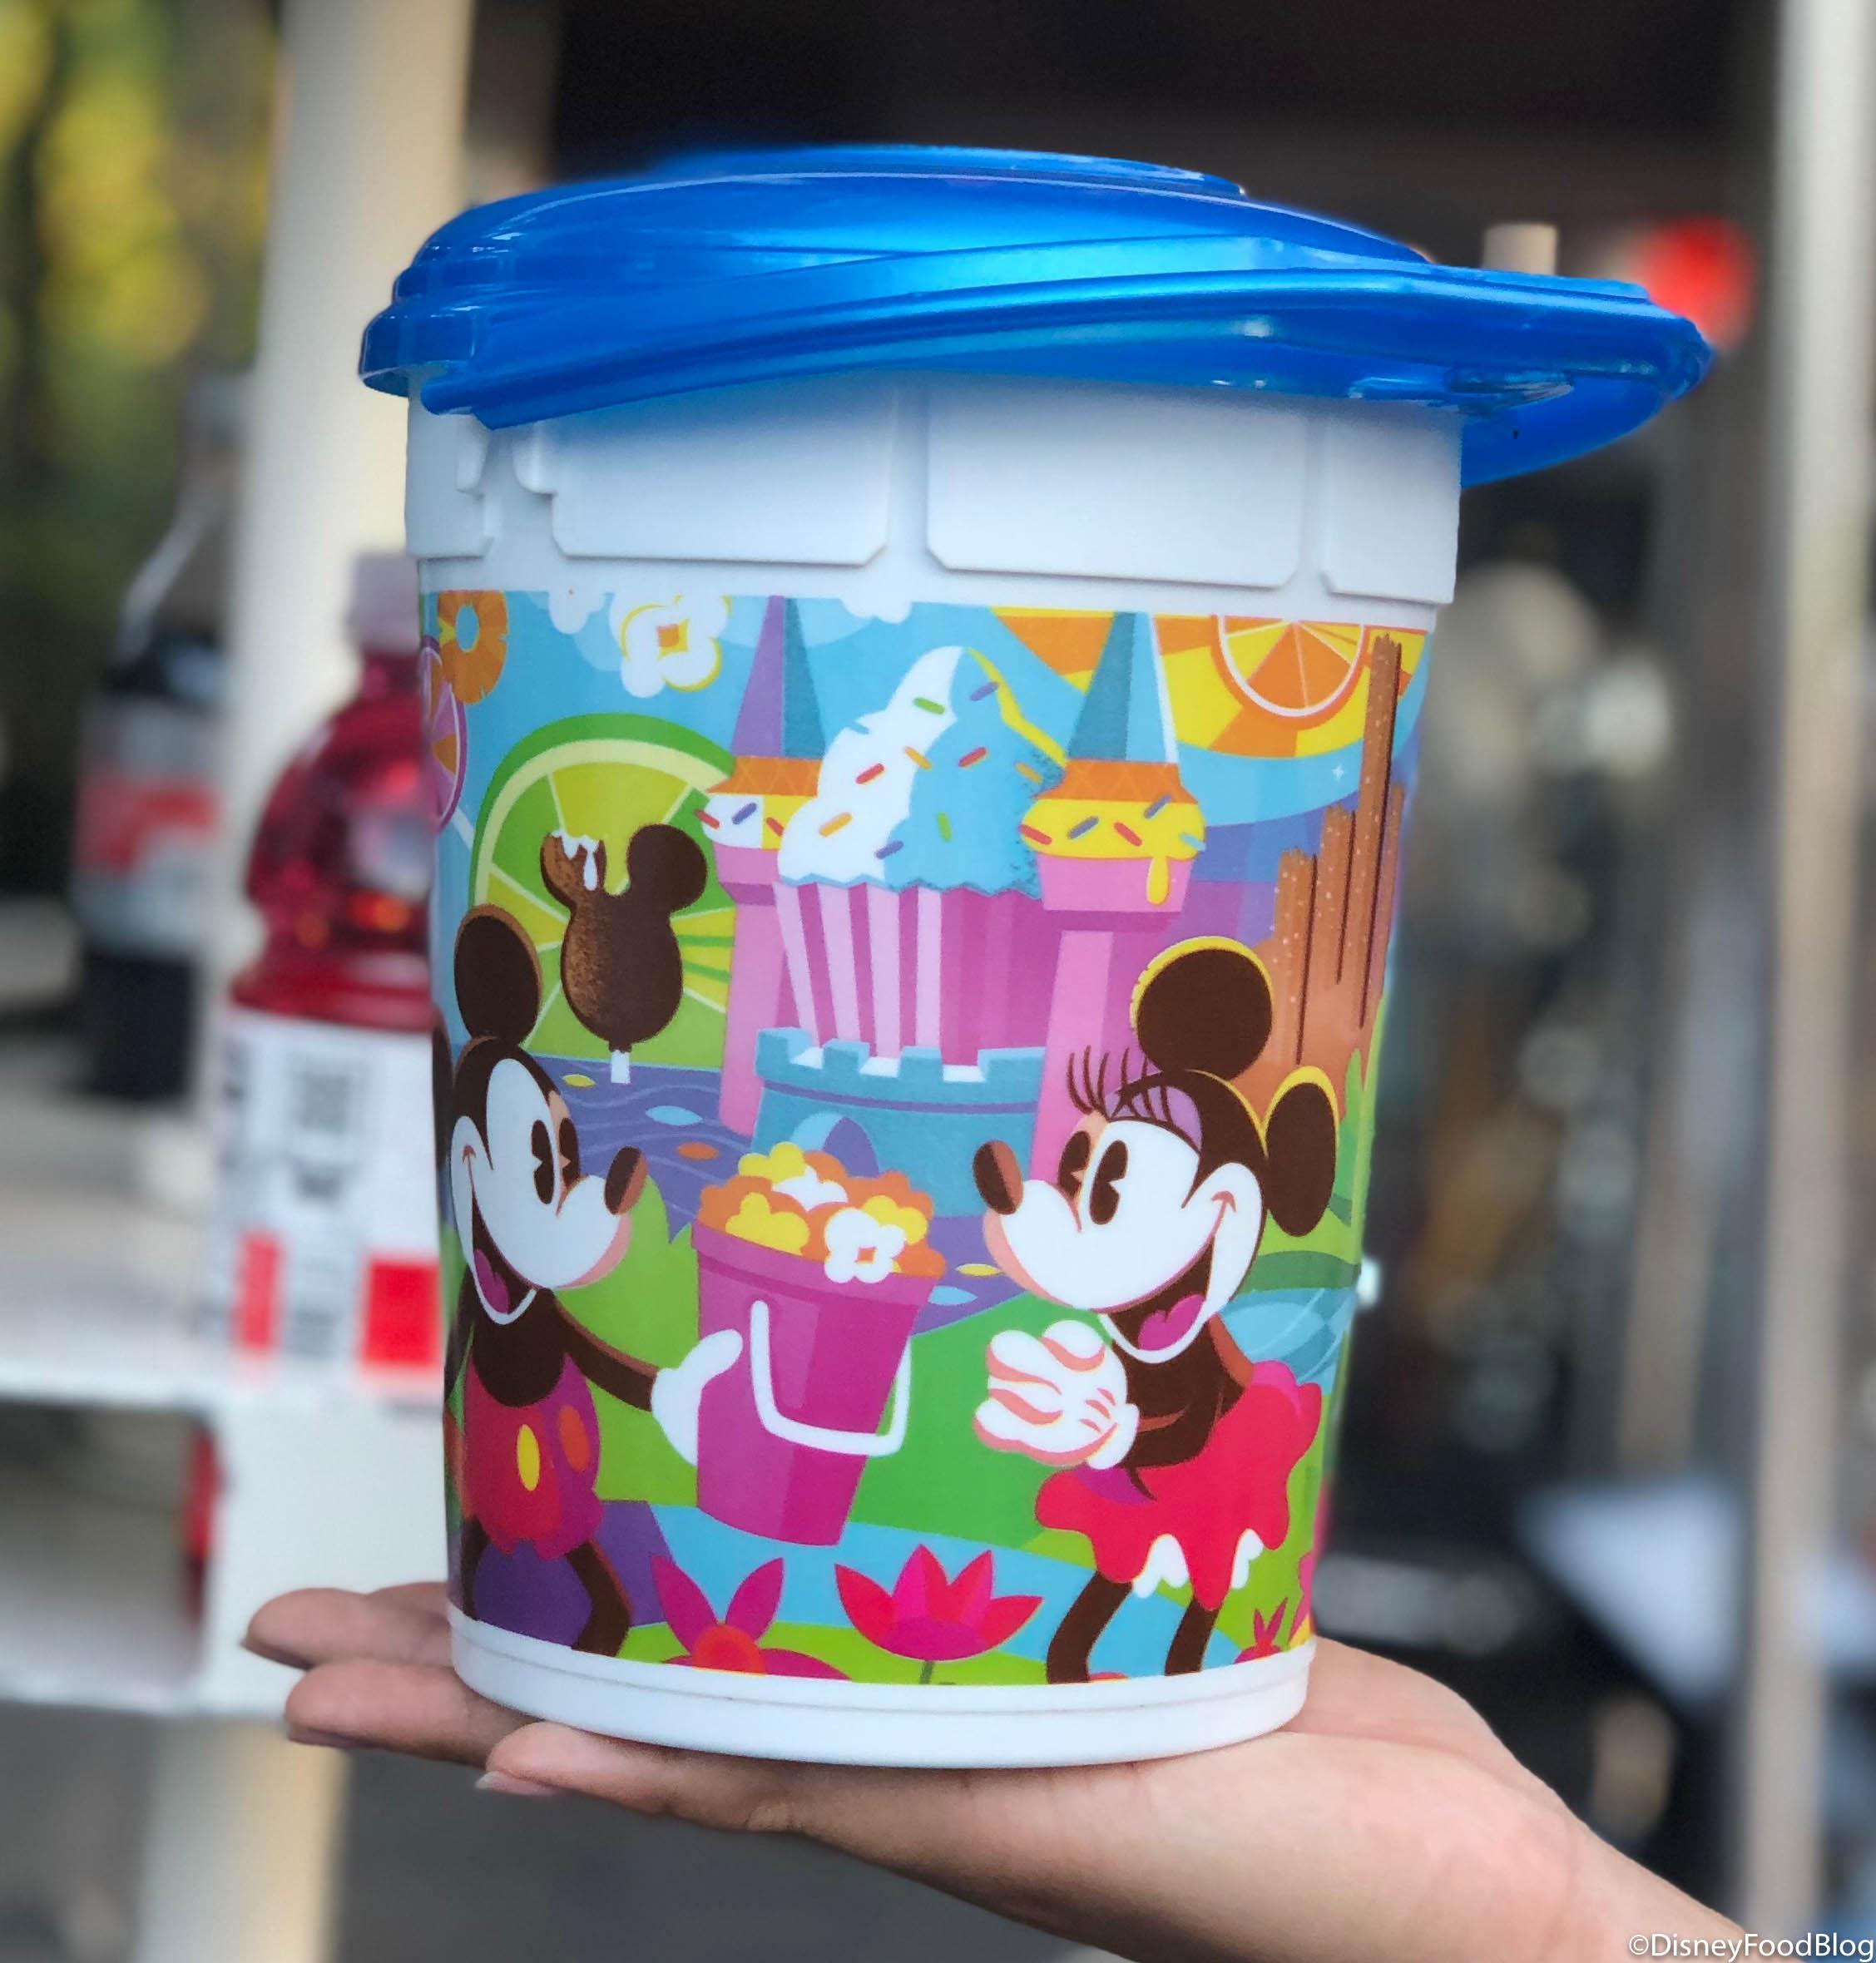 Donald Duck Disneyland Donald Duck Popcorn Bucket Souvenir 50th Anniversary ft